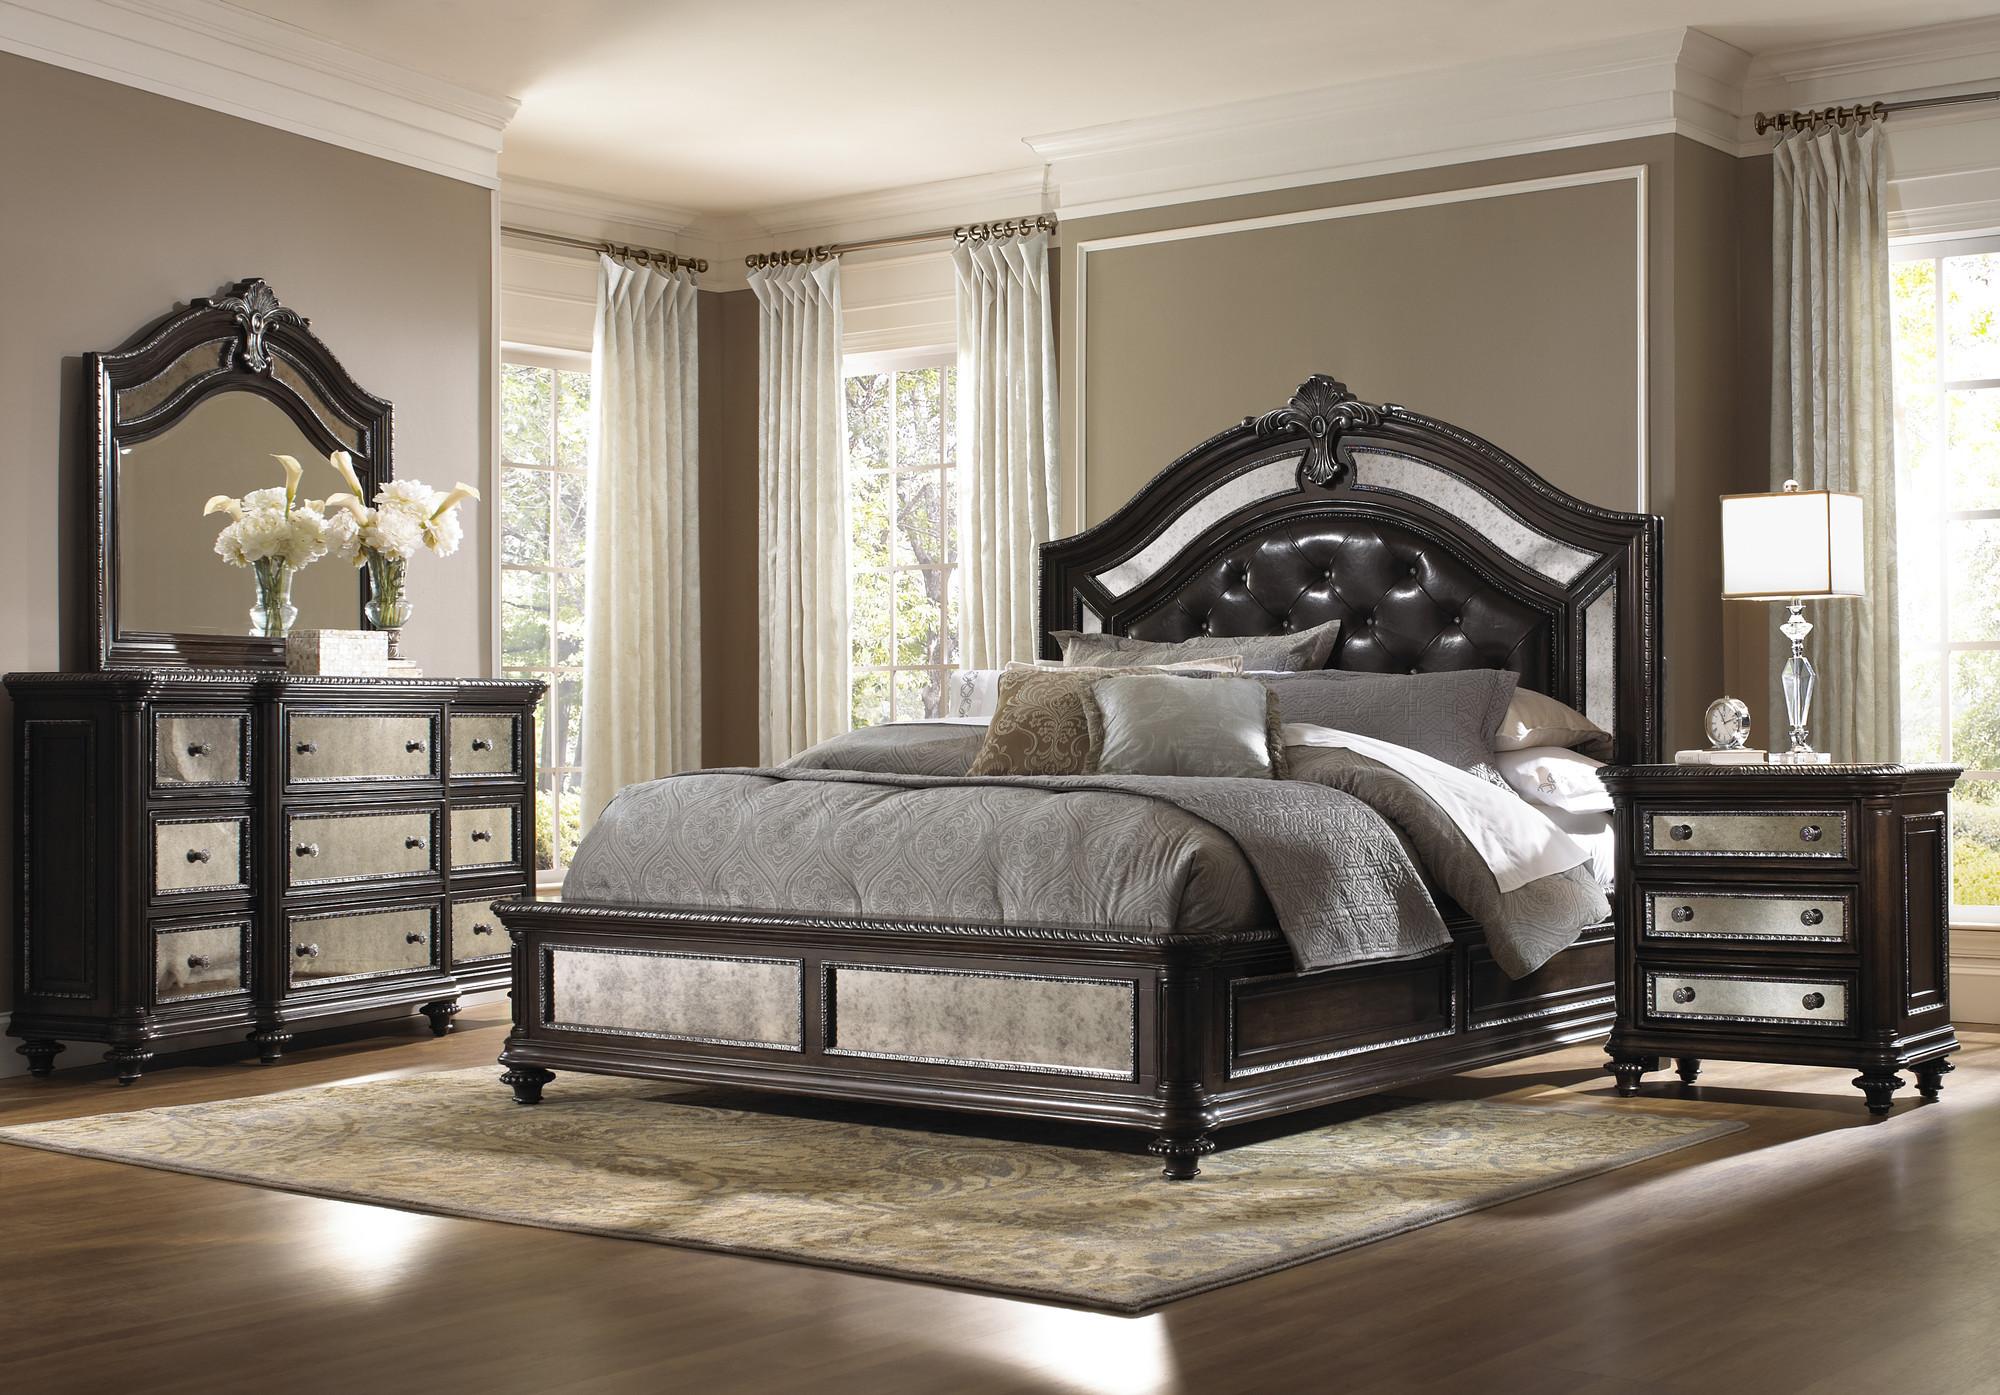 Best ideas about Wayfair Bedroom Sets . Save or Pin Living Room interesting wayfair furniture Wayfair Now.